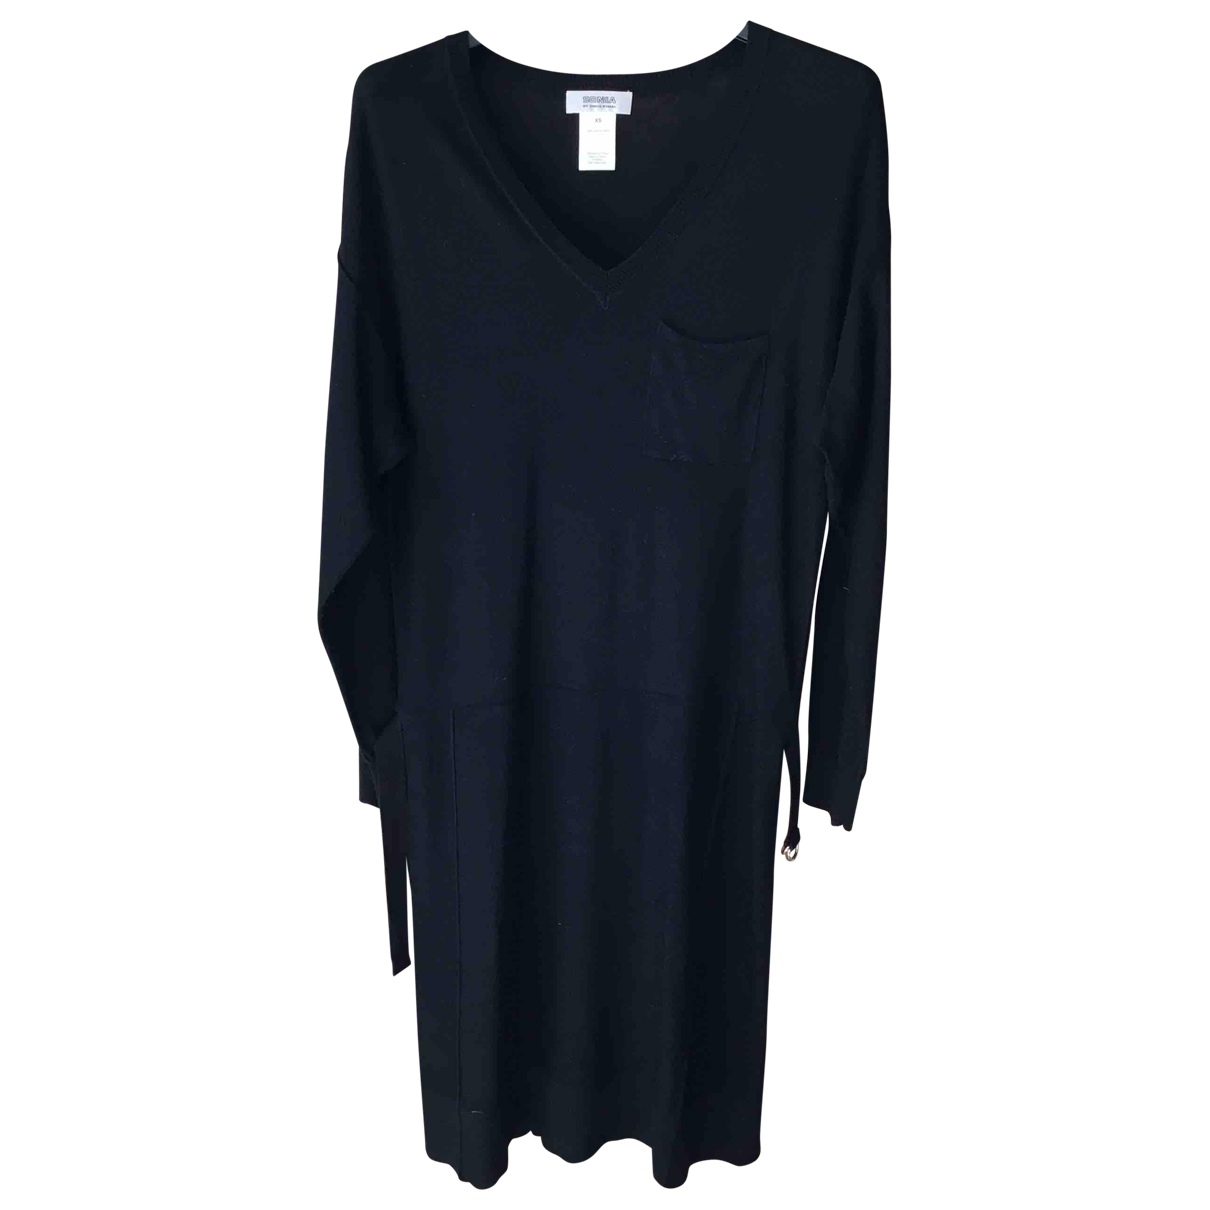 Sonia By Sonia Rykiel \N Black Wool dress for Women 38 FR